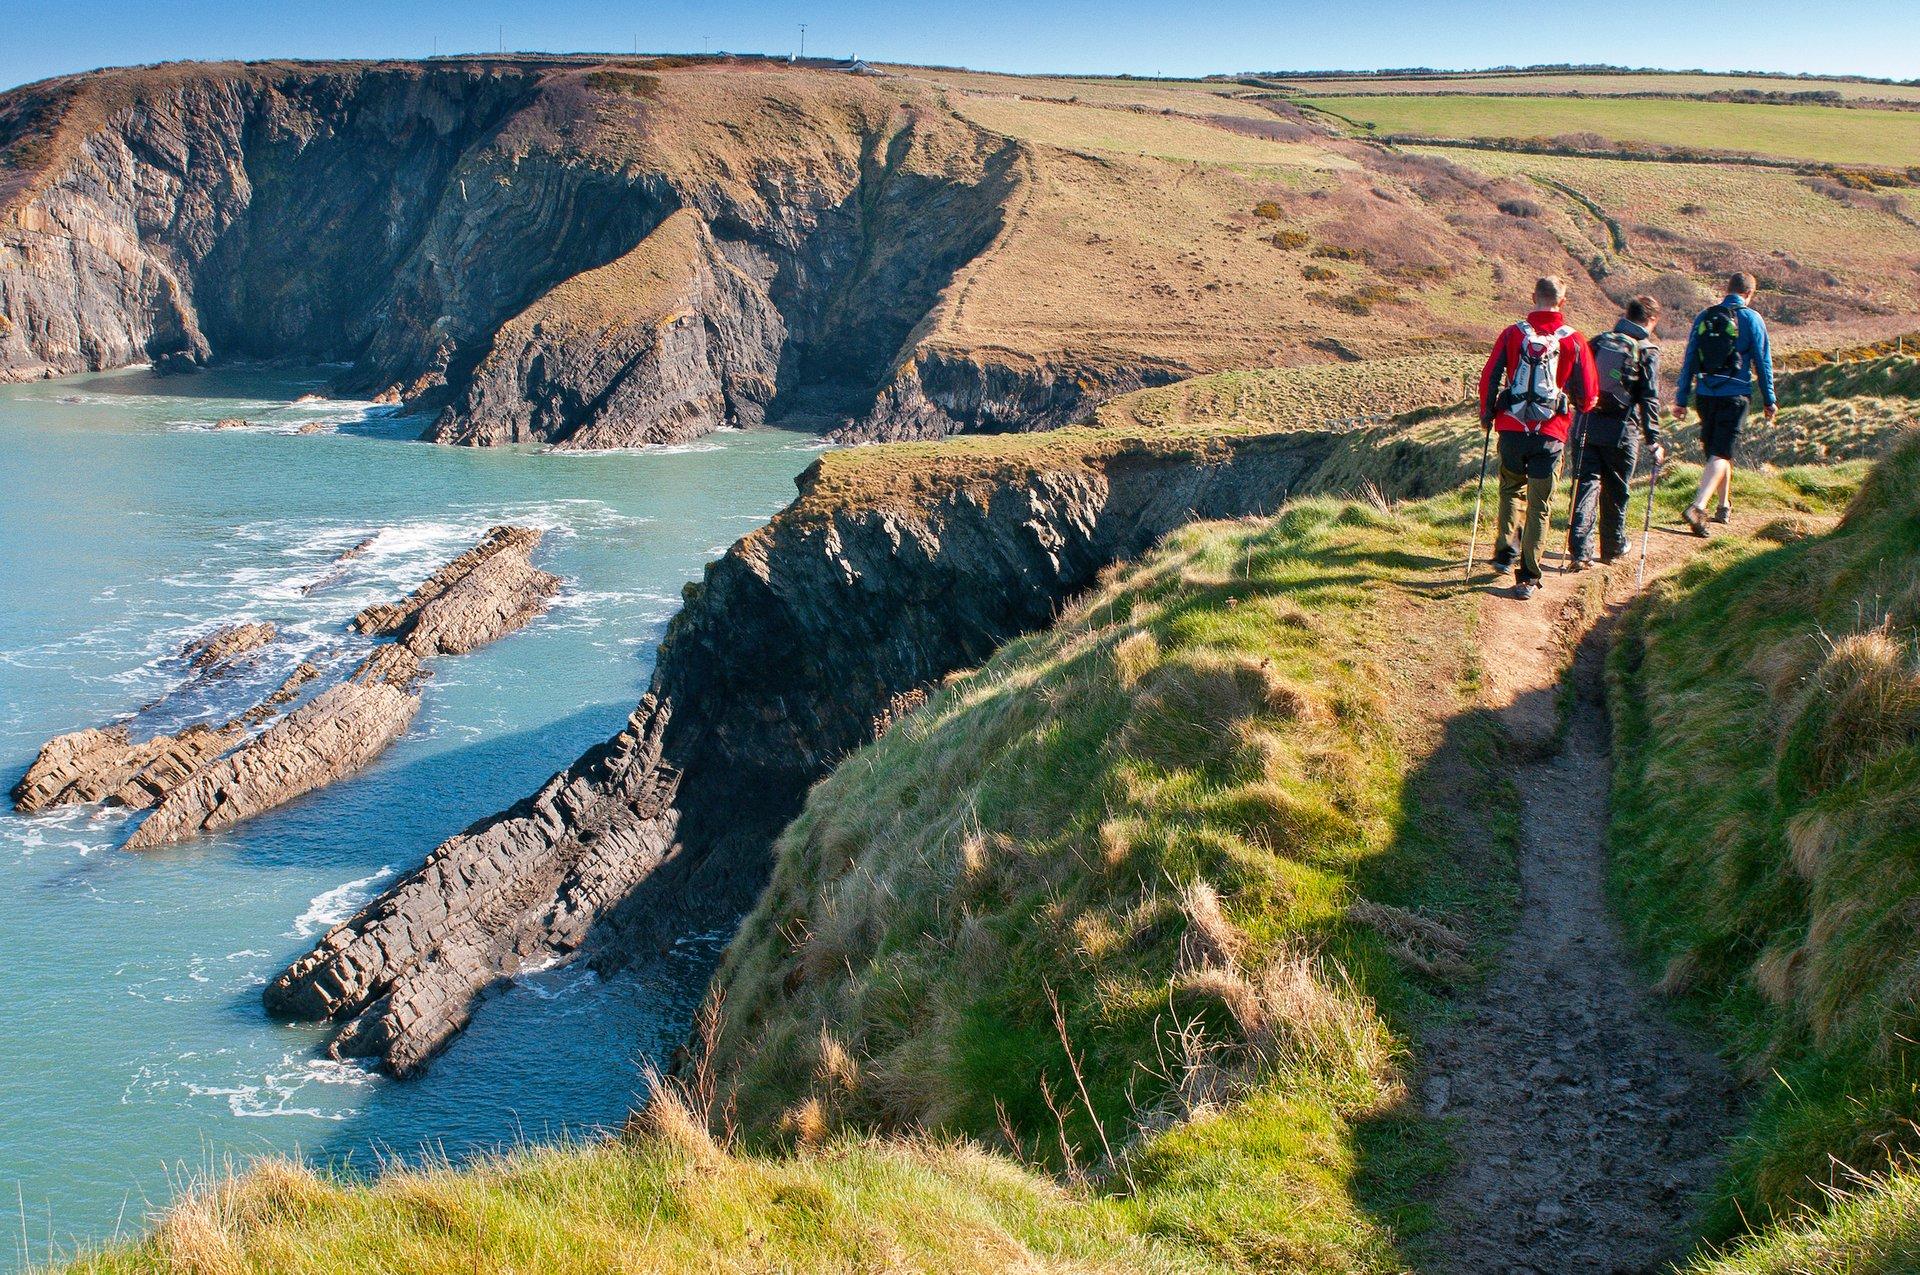 Walkers on Path near Ceibwr Bay, Pembrokeshire, Wales Coast Path 2020